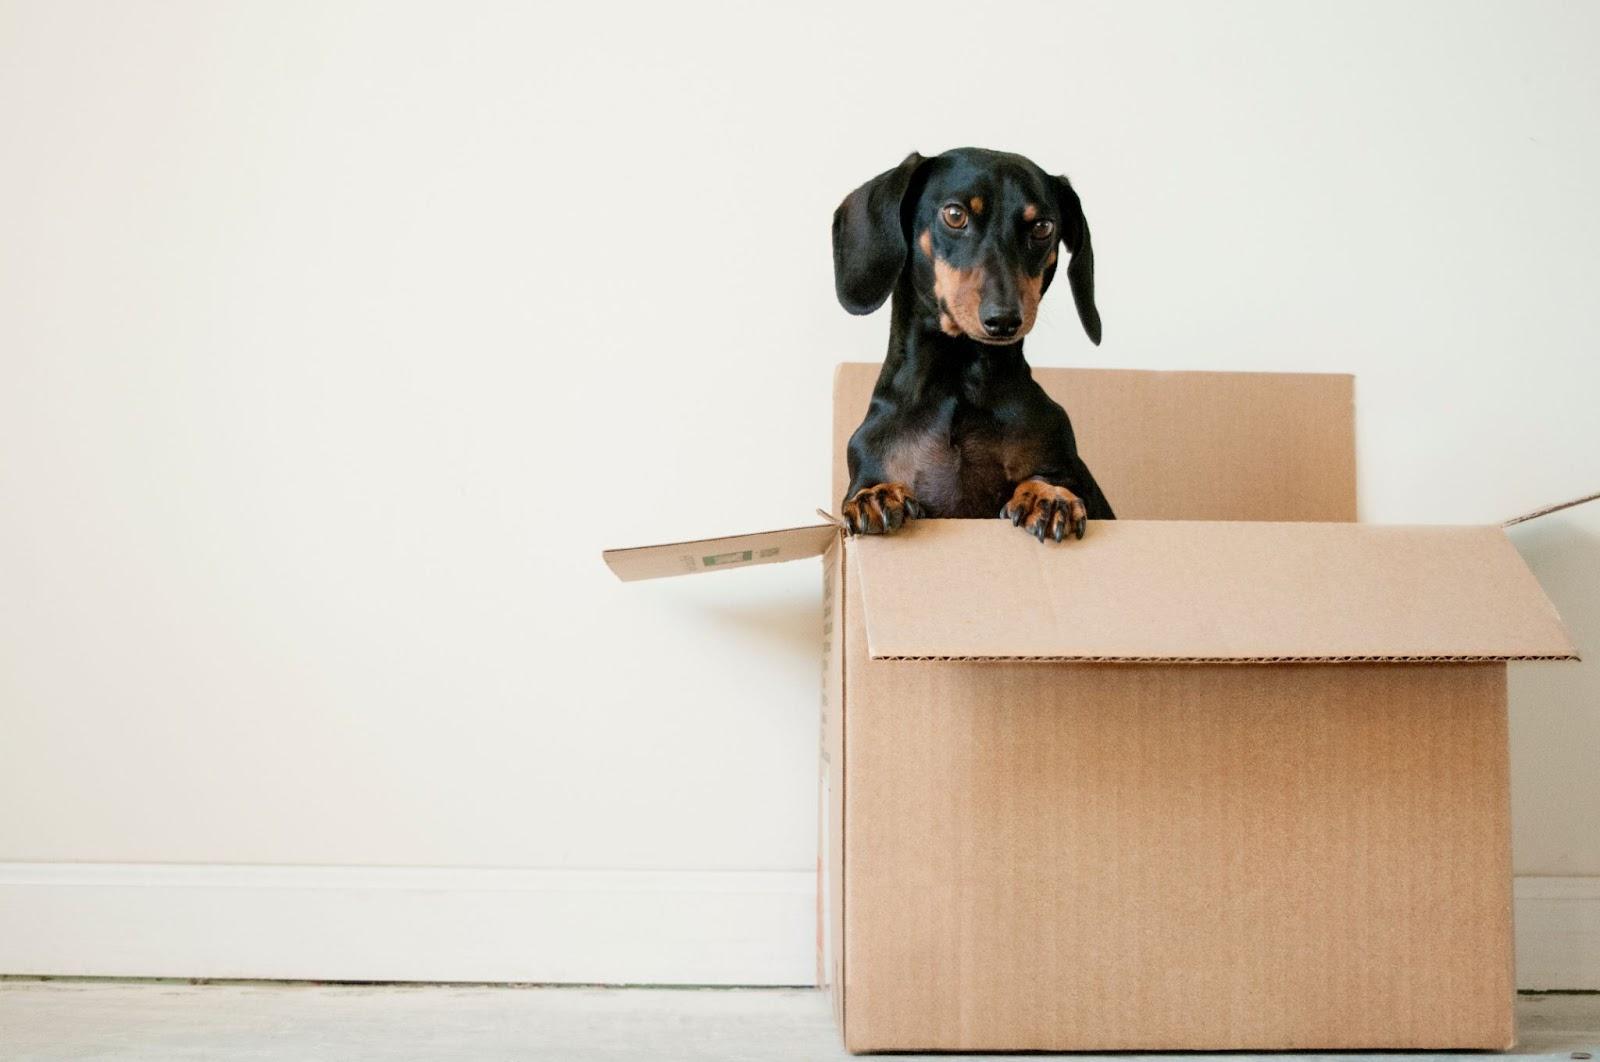 Dachshund dog peering up from inside cardboard box